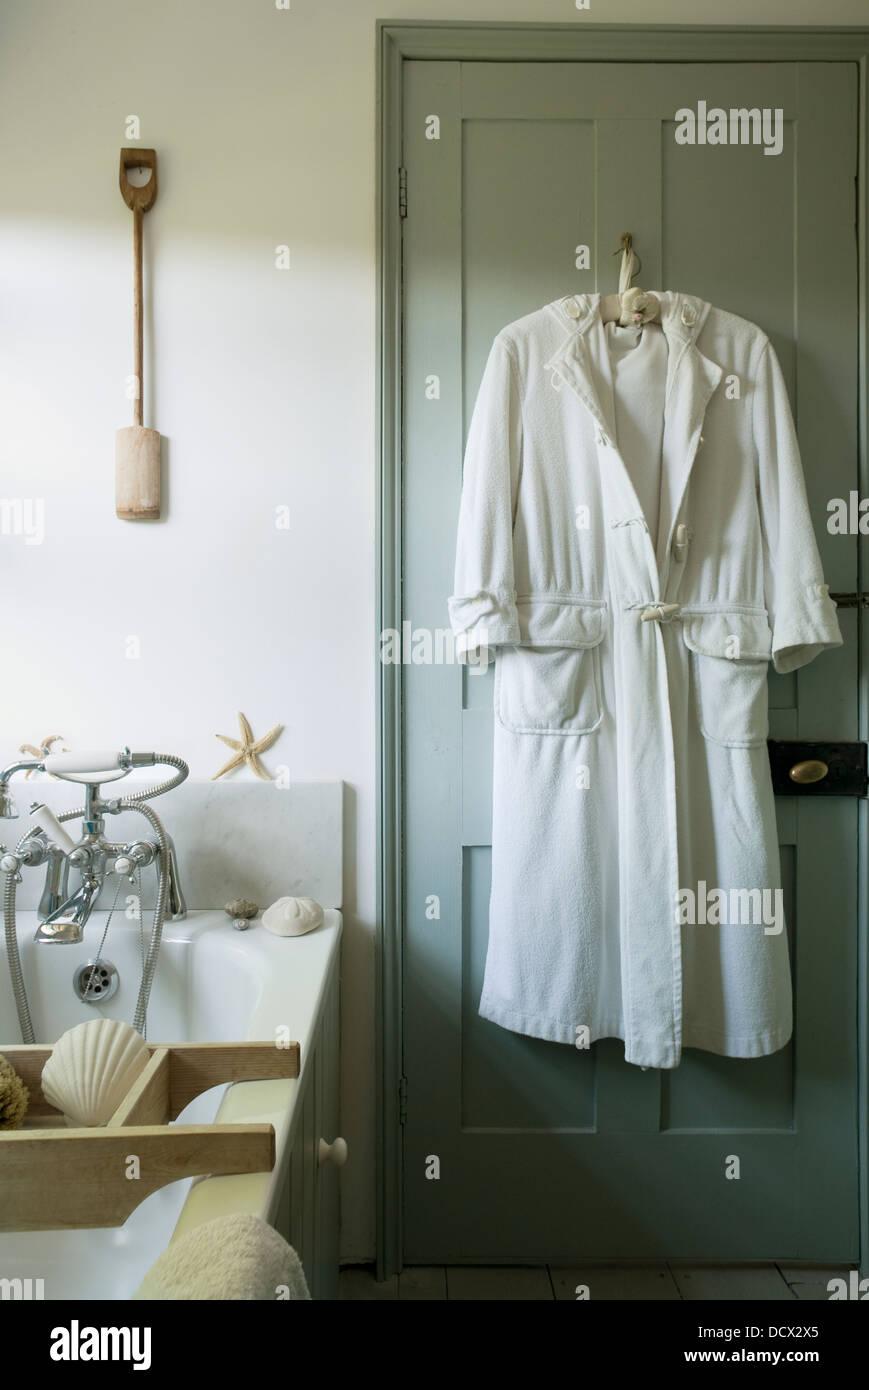 Peignoir Blanc Se Bloque L Arri Re De La Porte De La Salle De